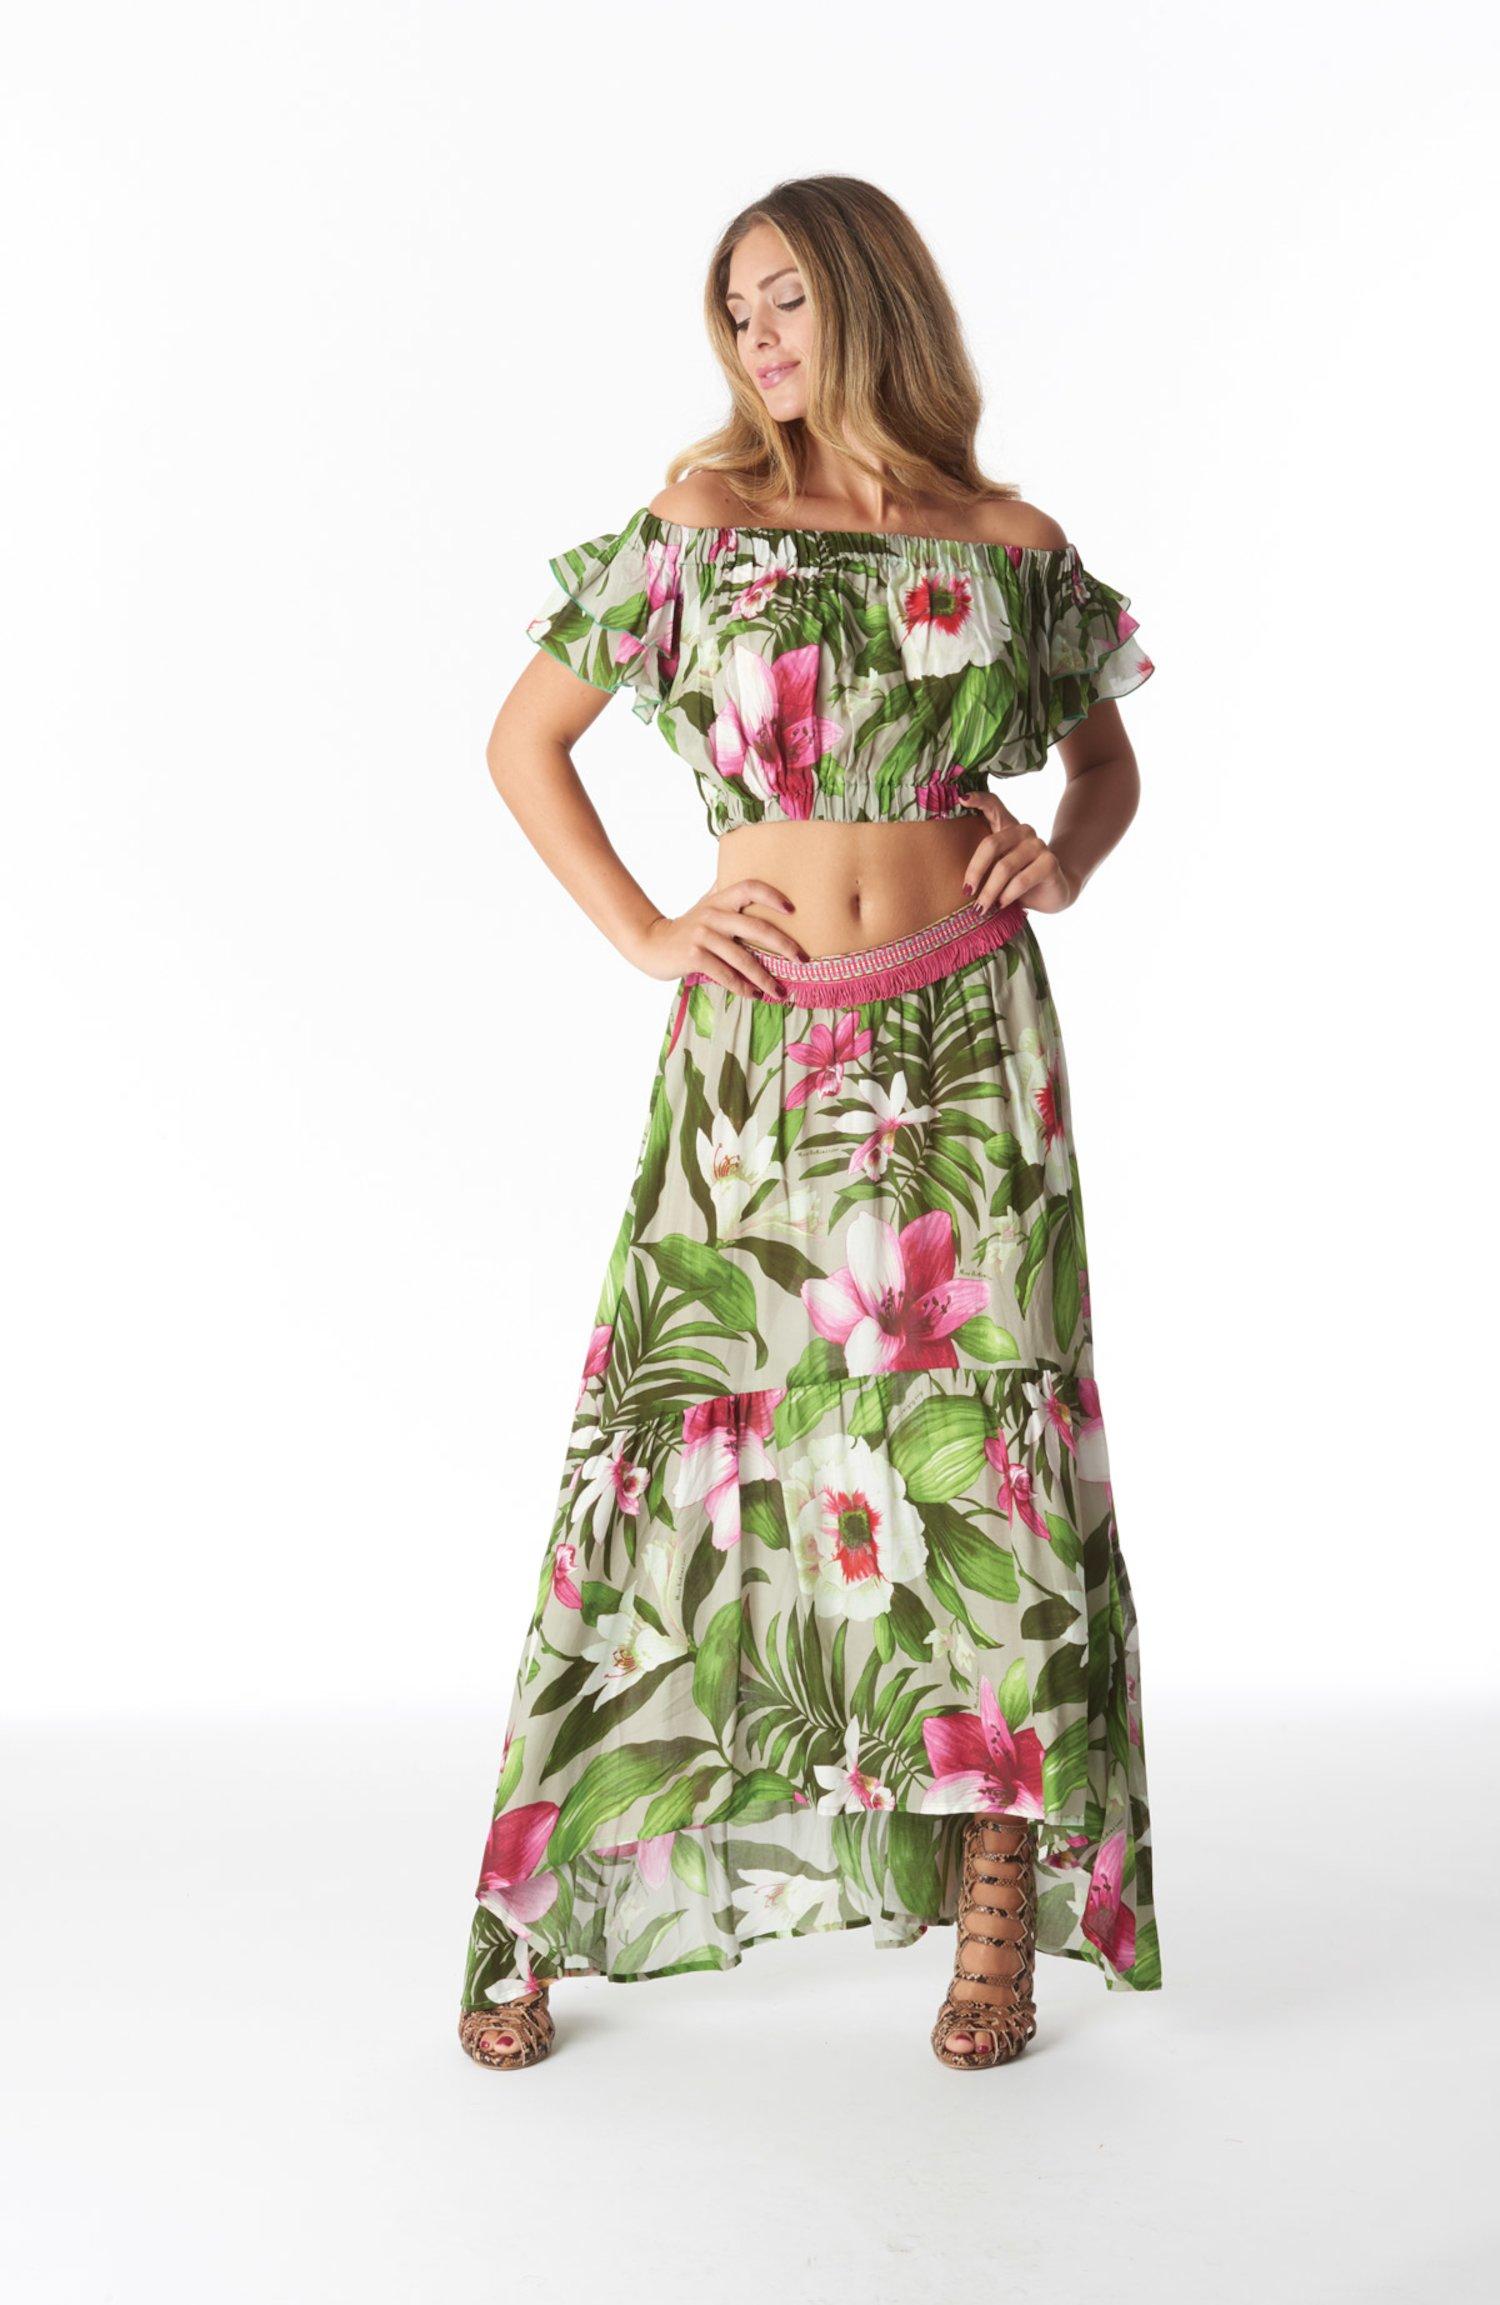 LONG SKIRT TRIMMINGS BELT - Tropical Flowers Beige